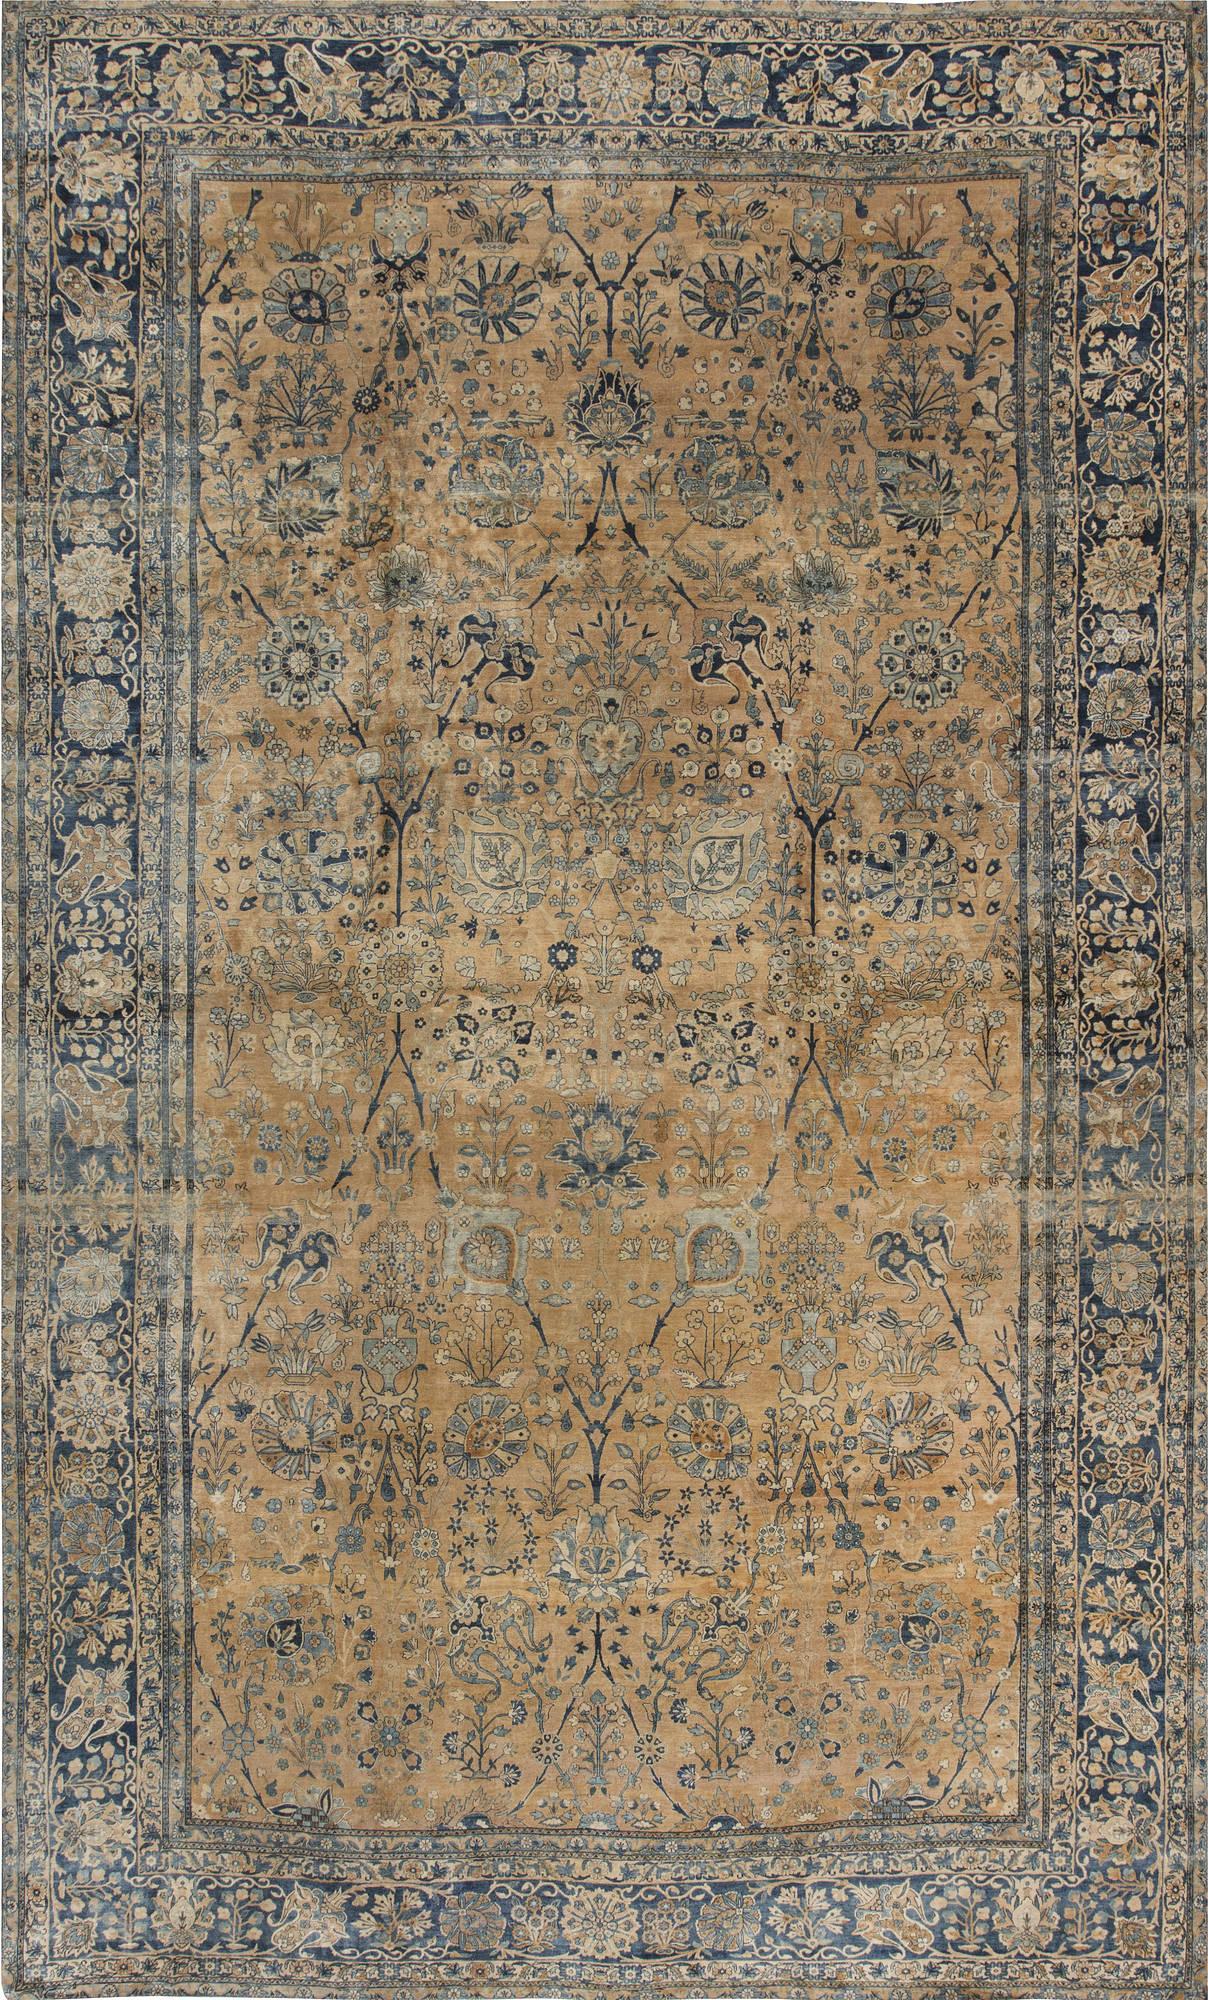 Antique Persian Kirman Carpet BB6742